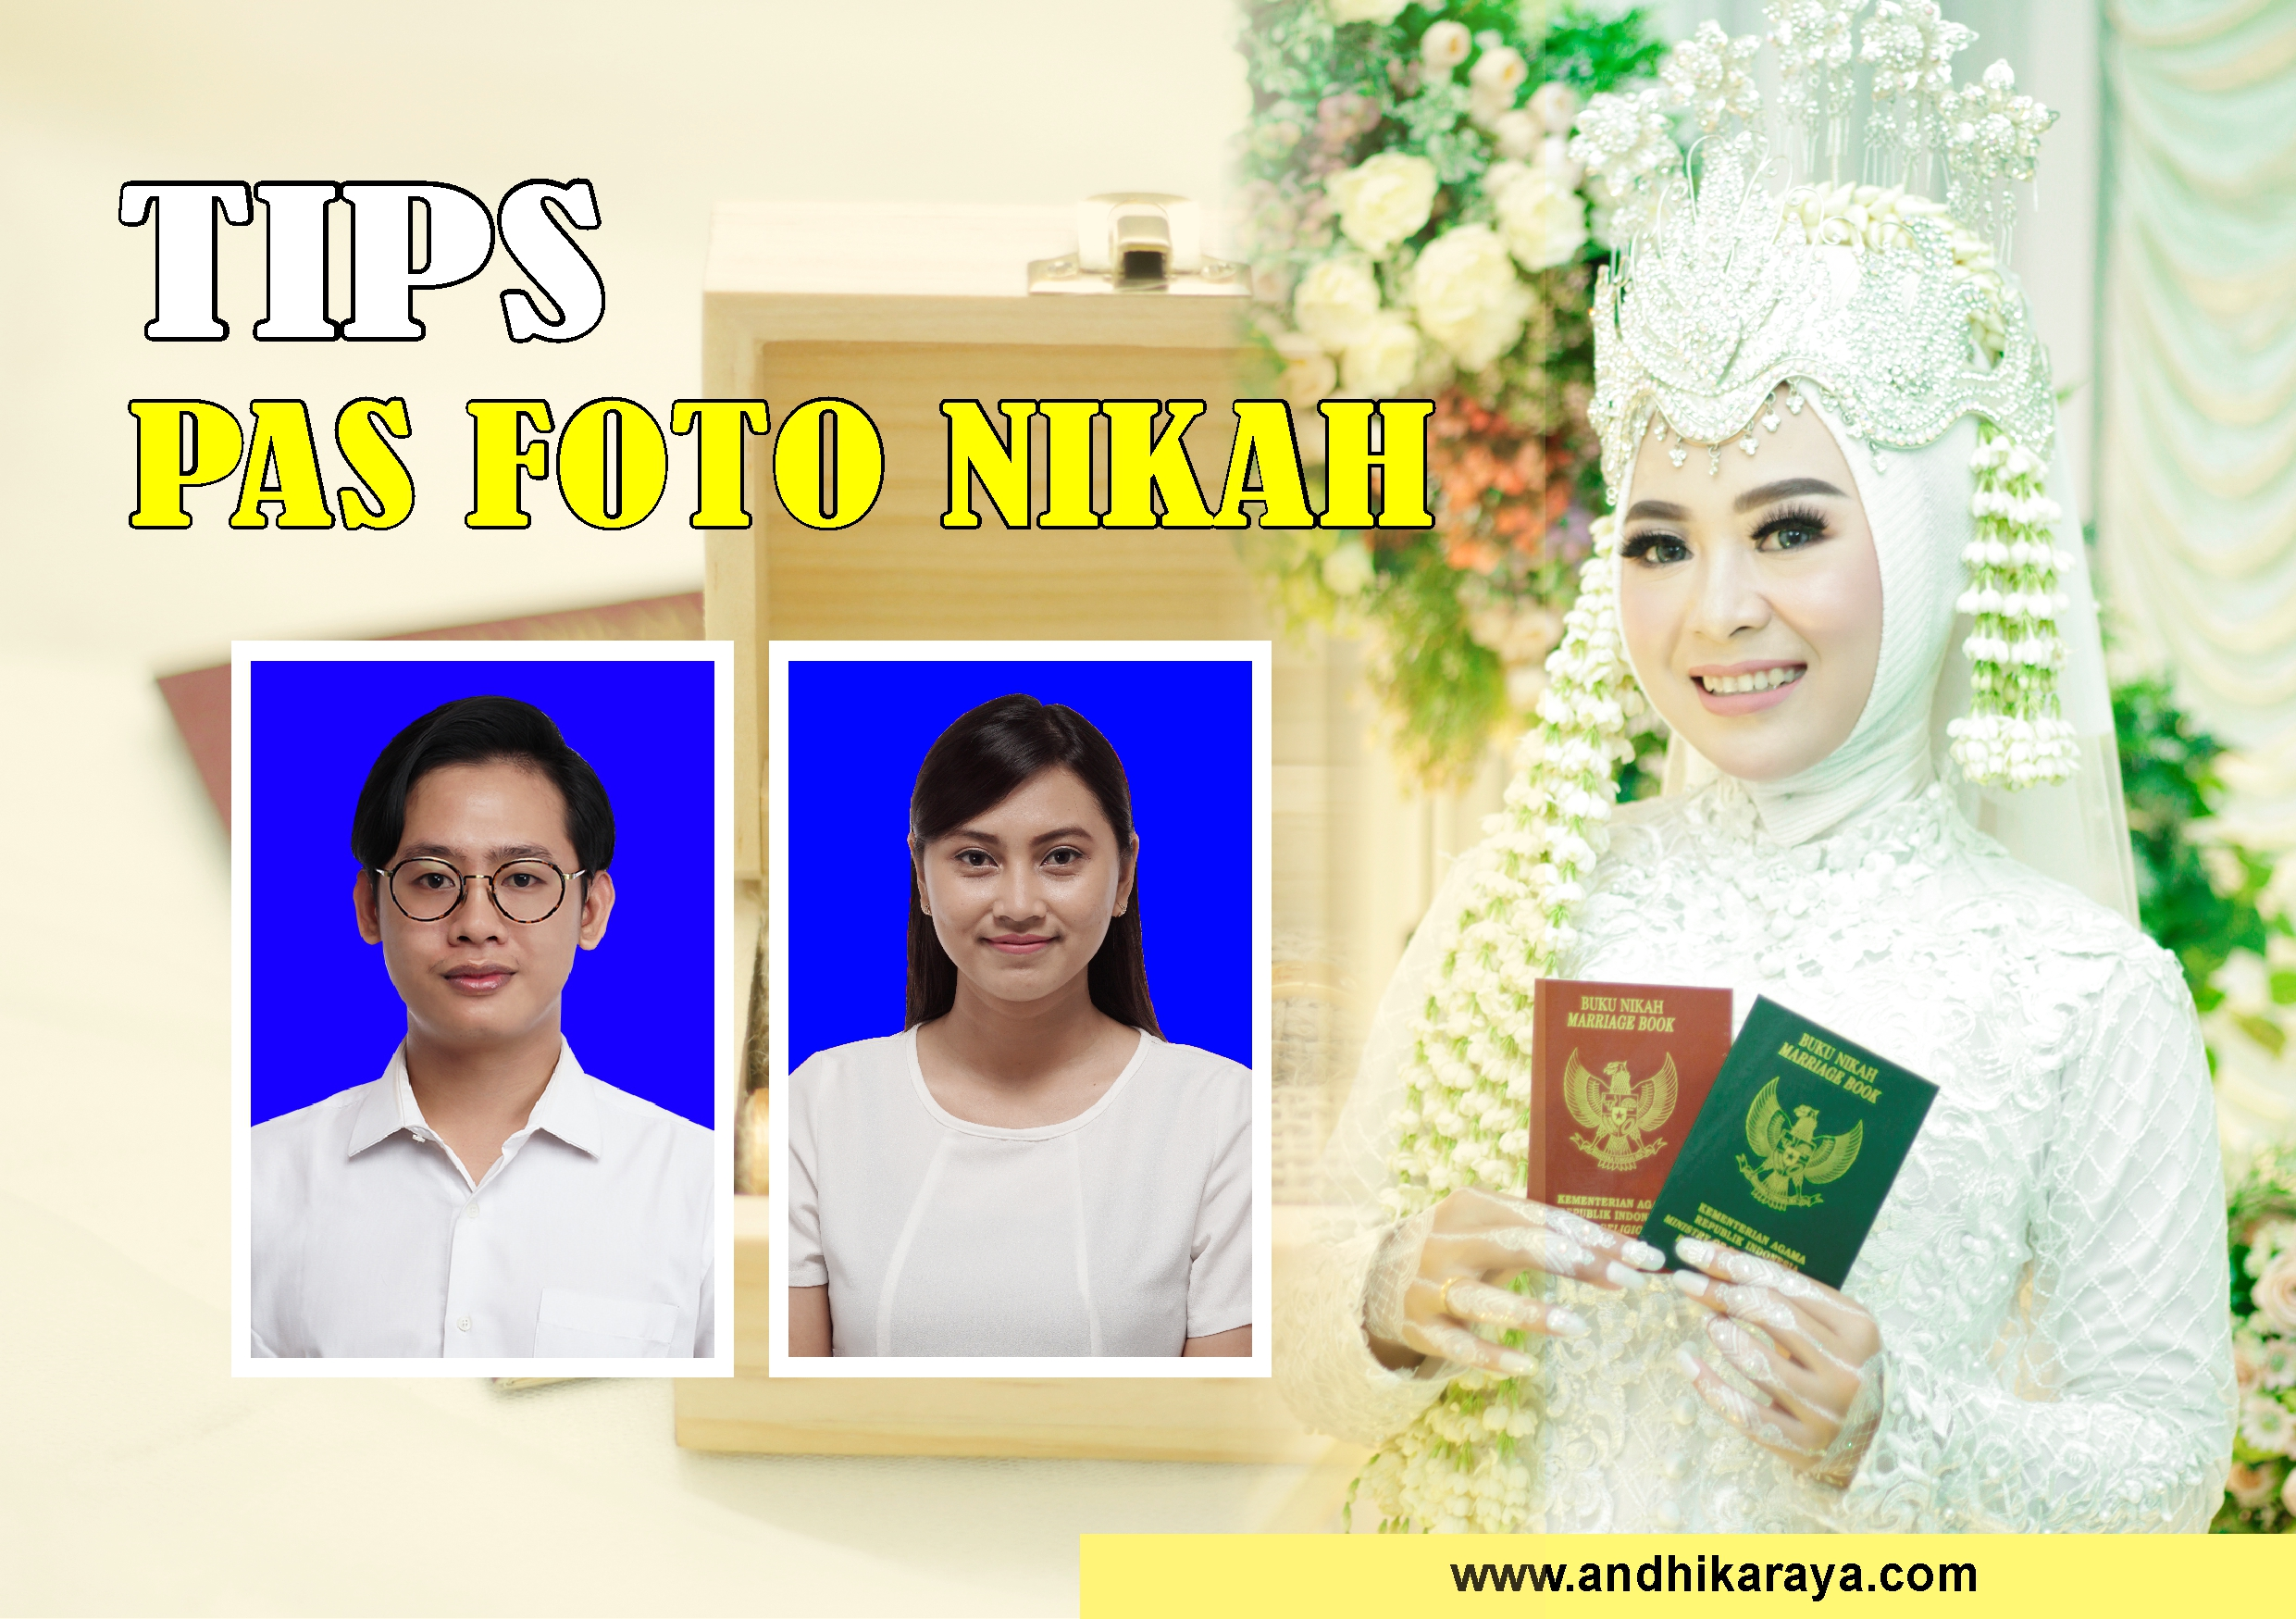 Tips pas foto nikah